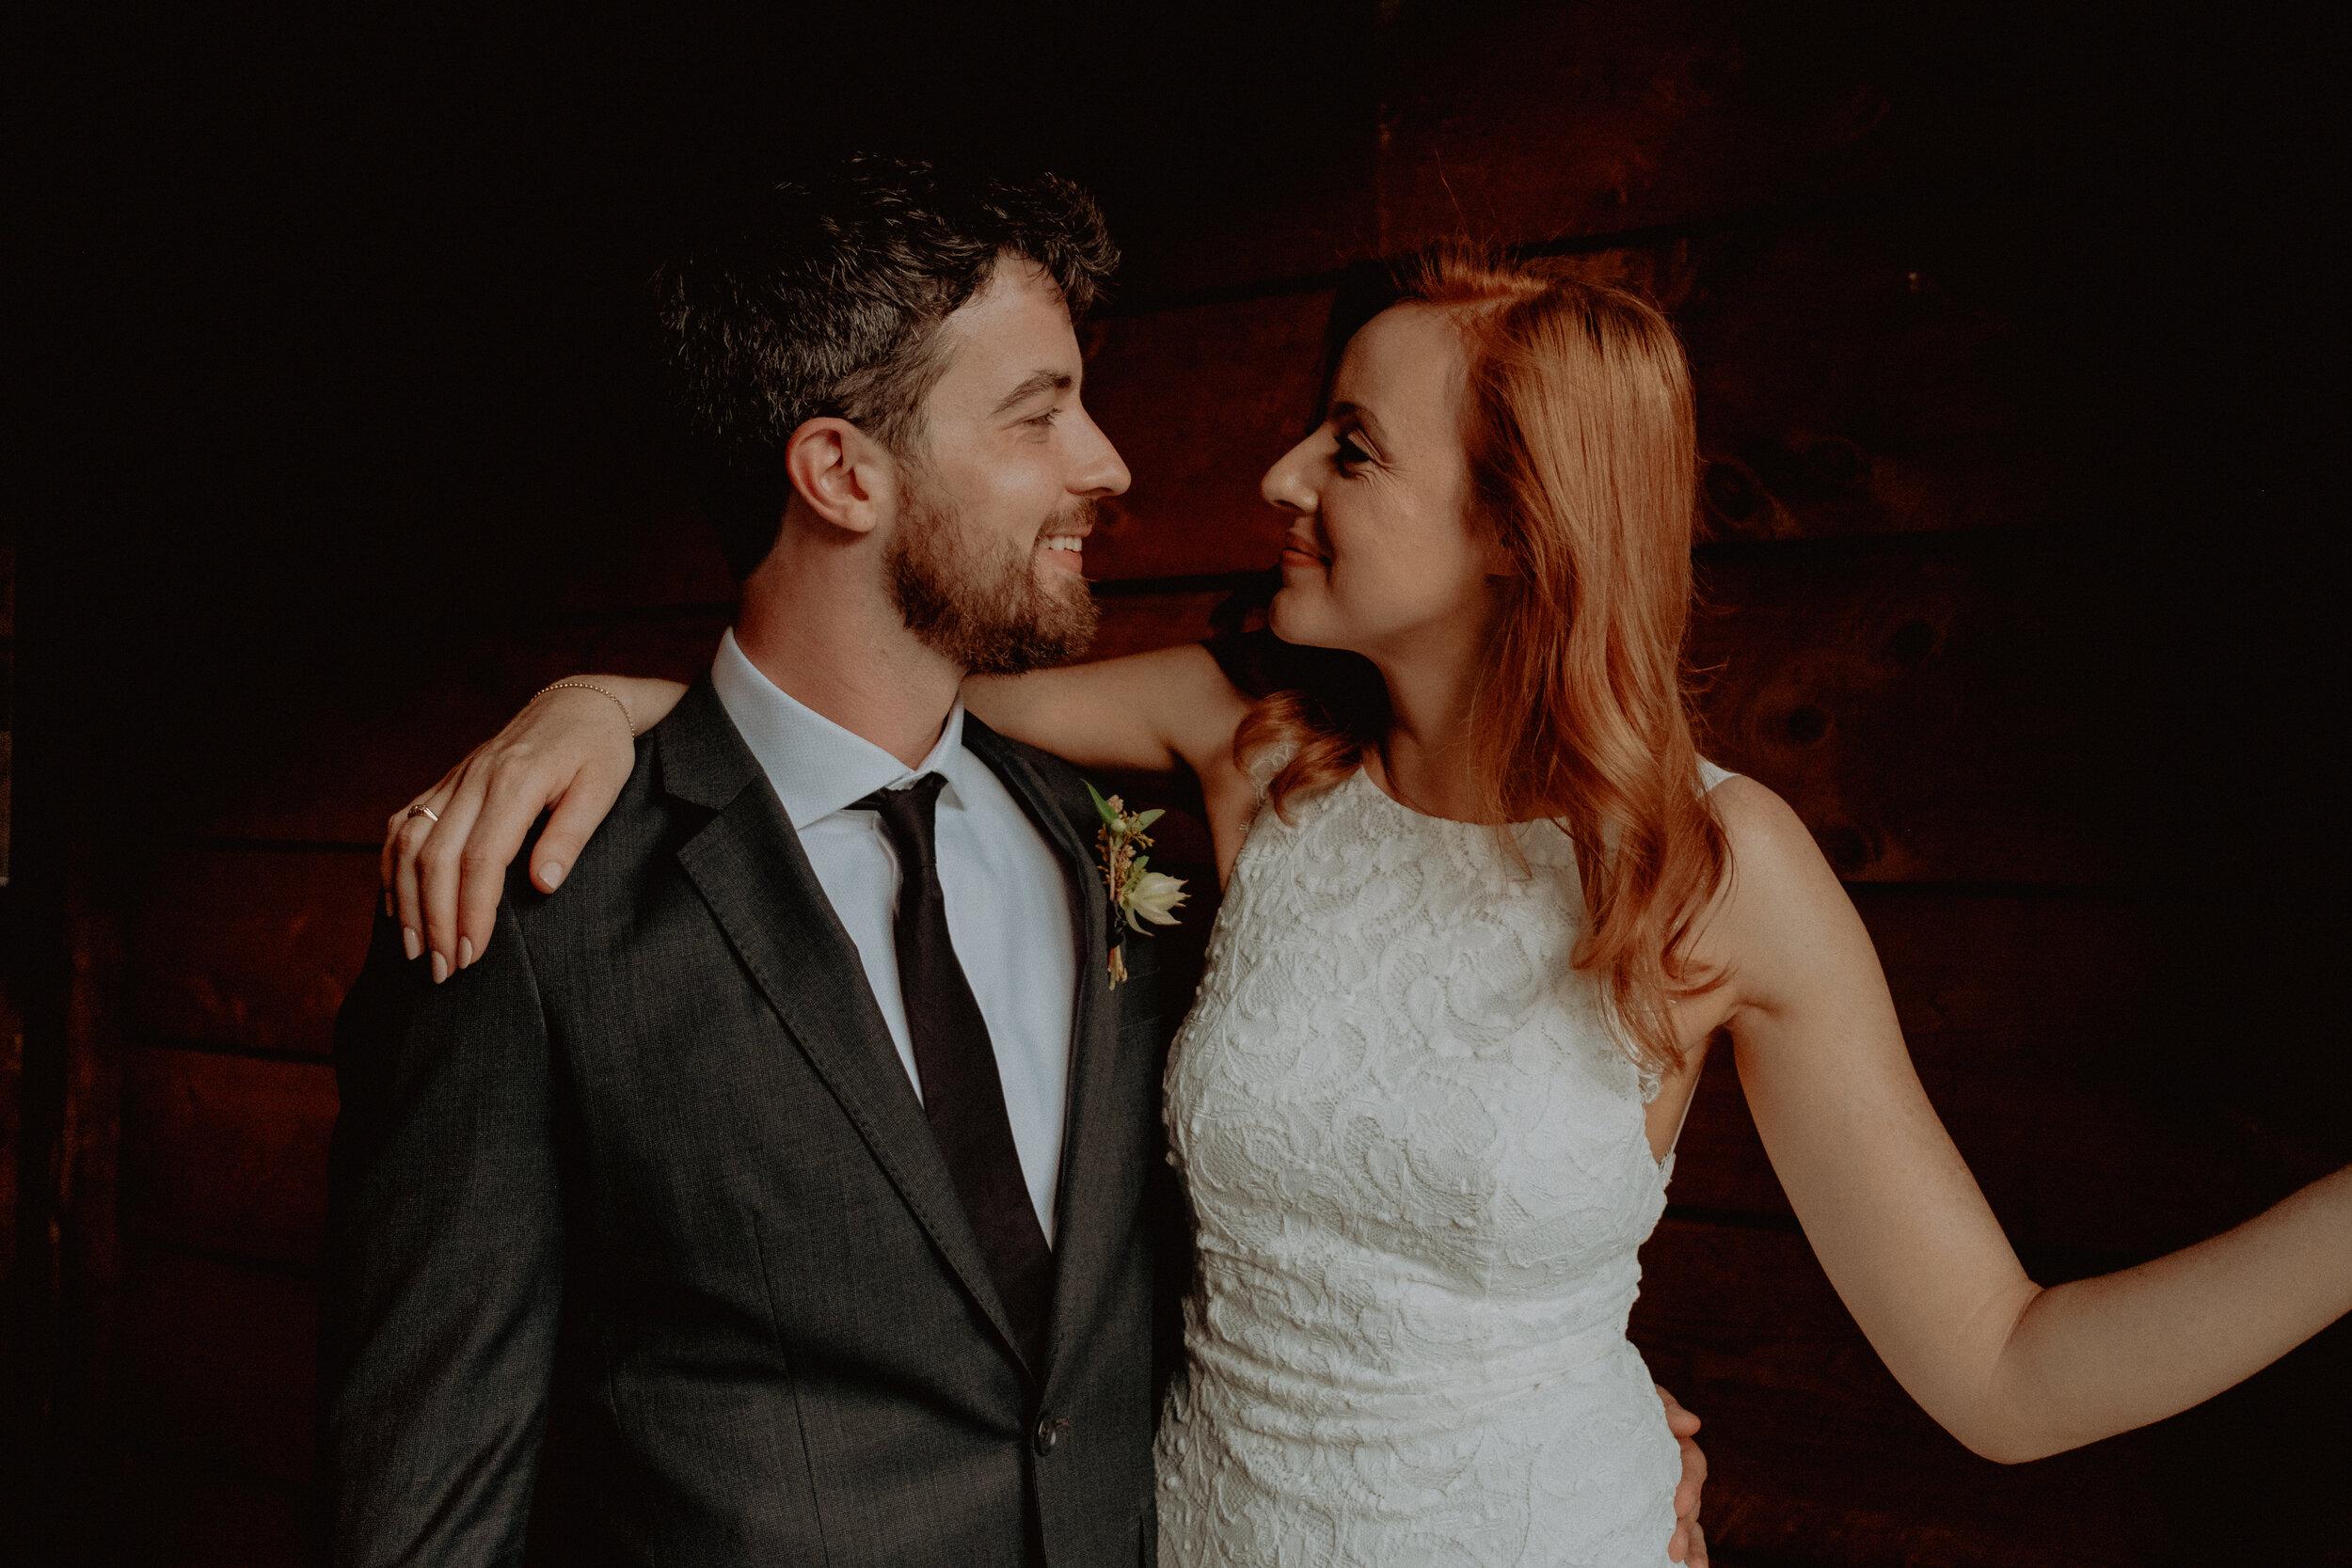 Aurora_Brooklyn_Wedding_Photographer_Chellise_Michael_Photography-176.jpg